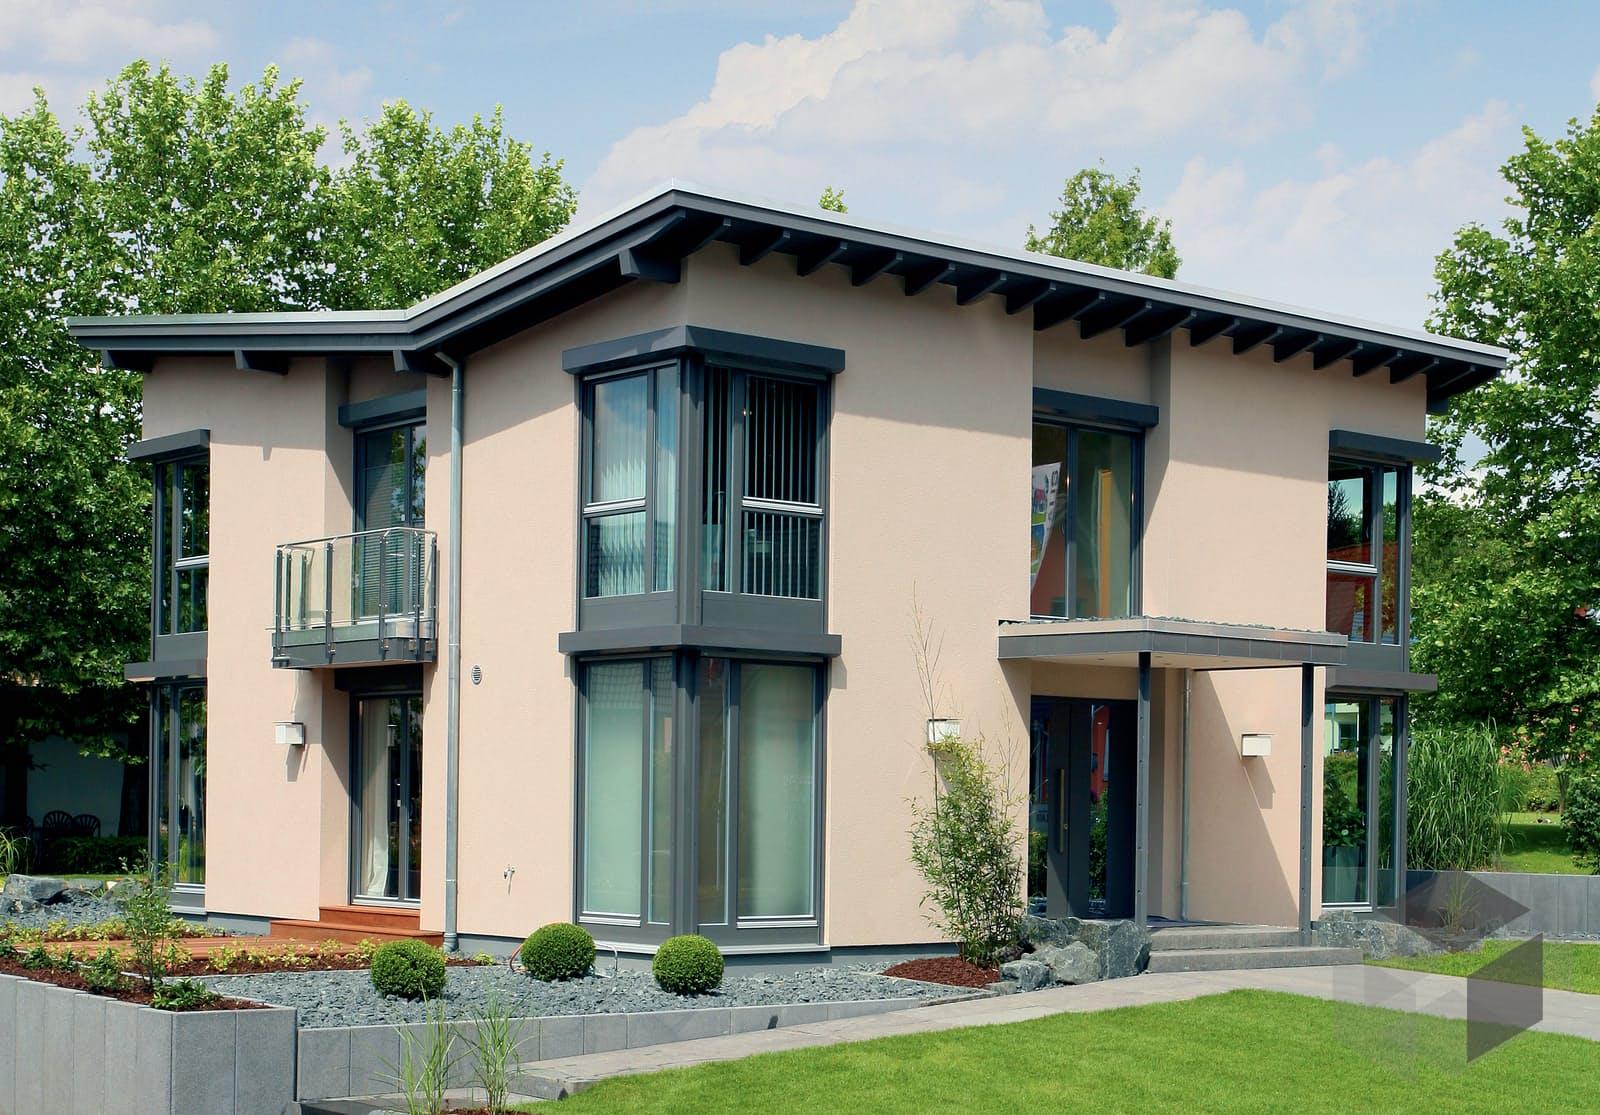 bravur 550 musterhaus bad vilbel von fingerhaus. Black Bedroom Furniture Sets. Home Design Ideas